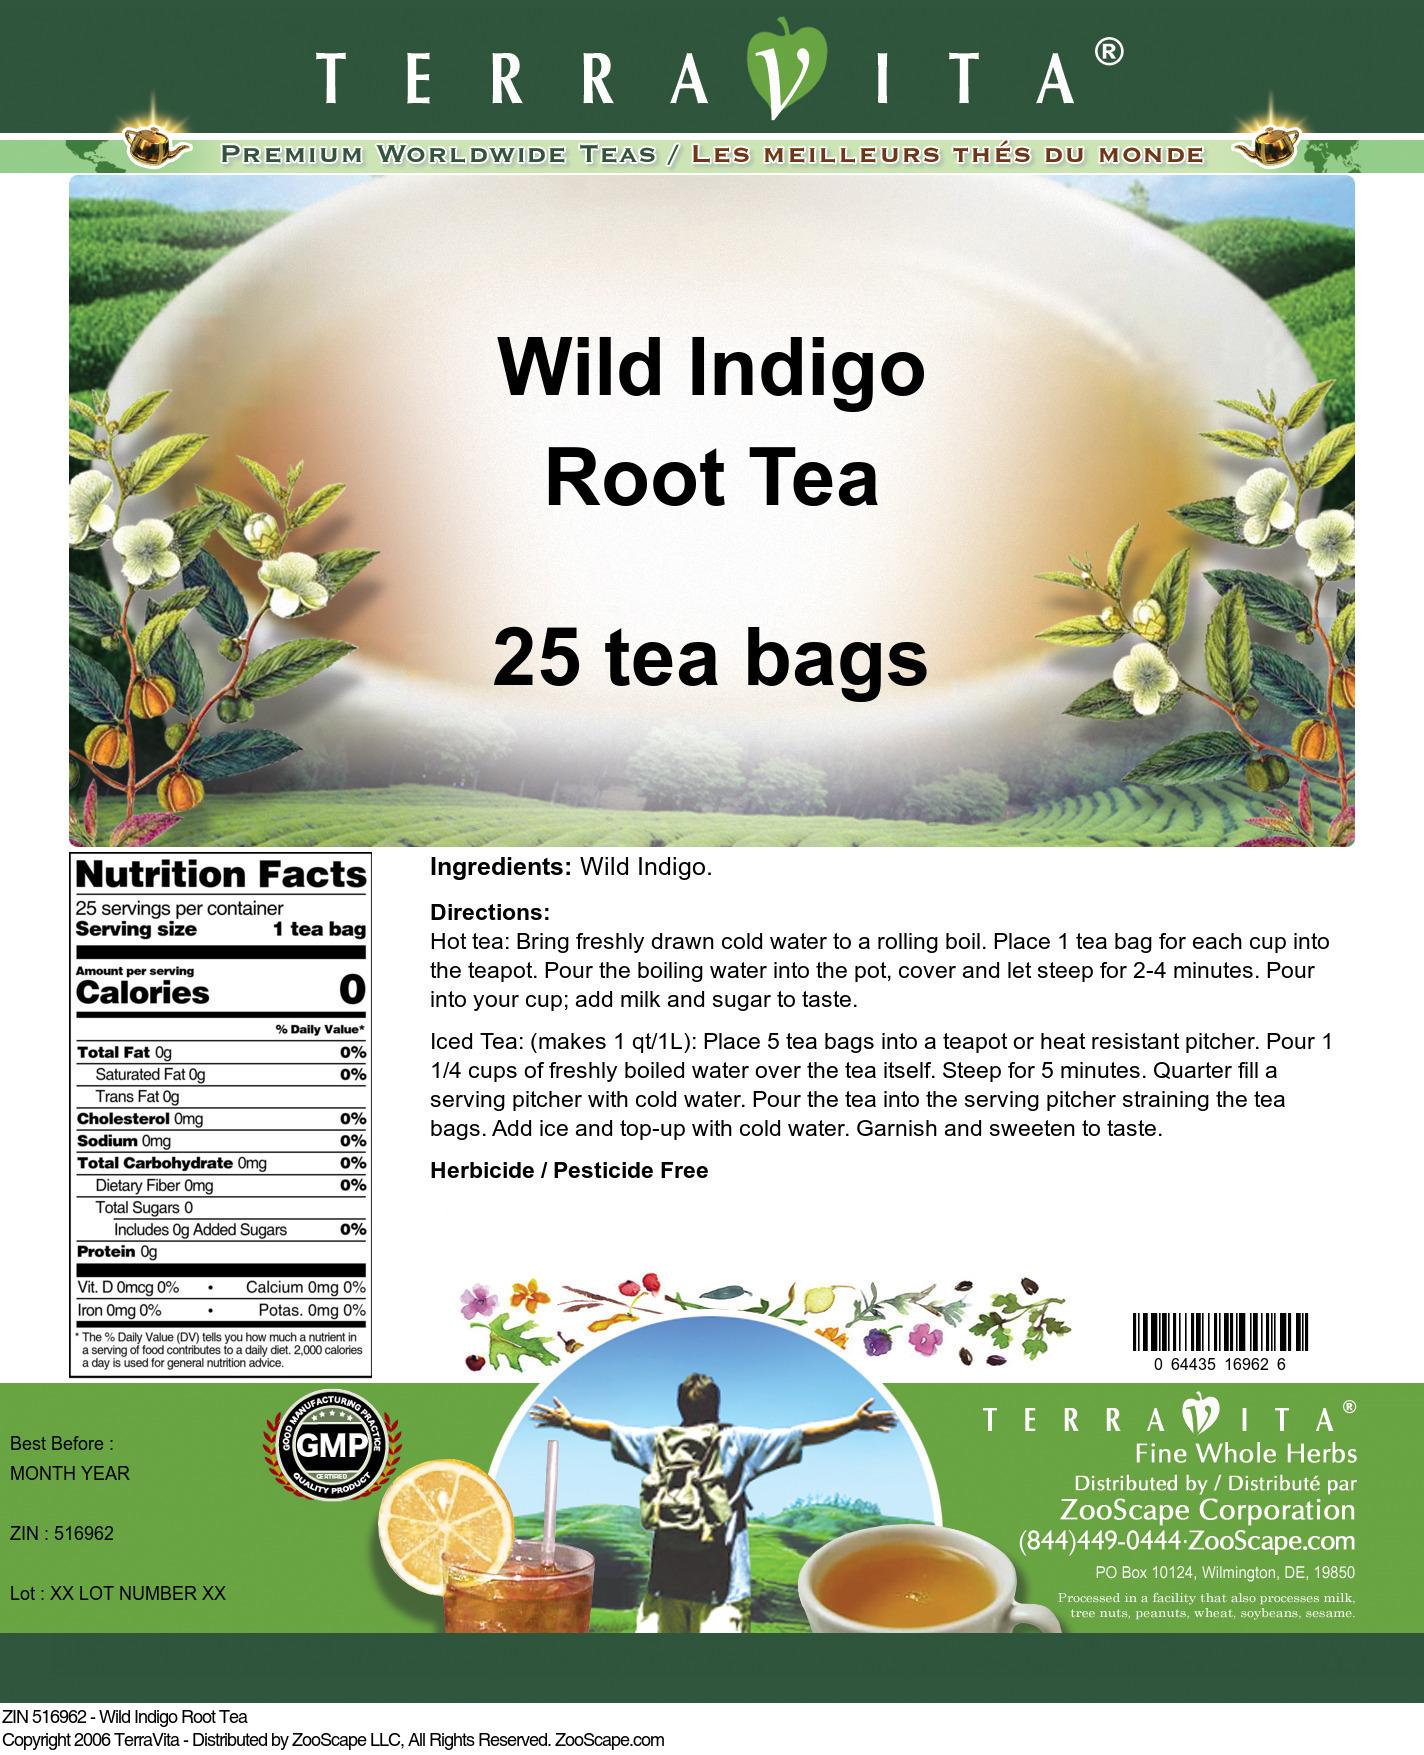 Wild Indigo Root